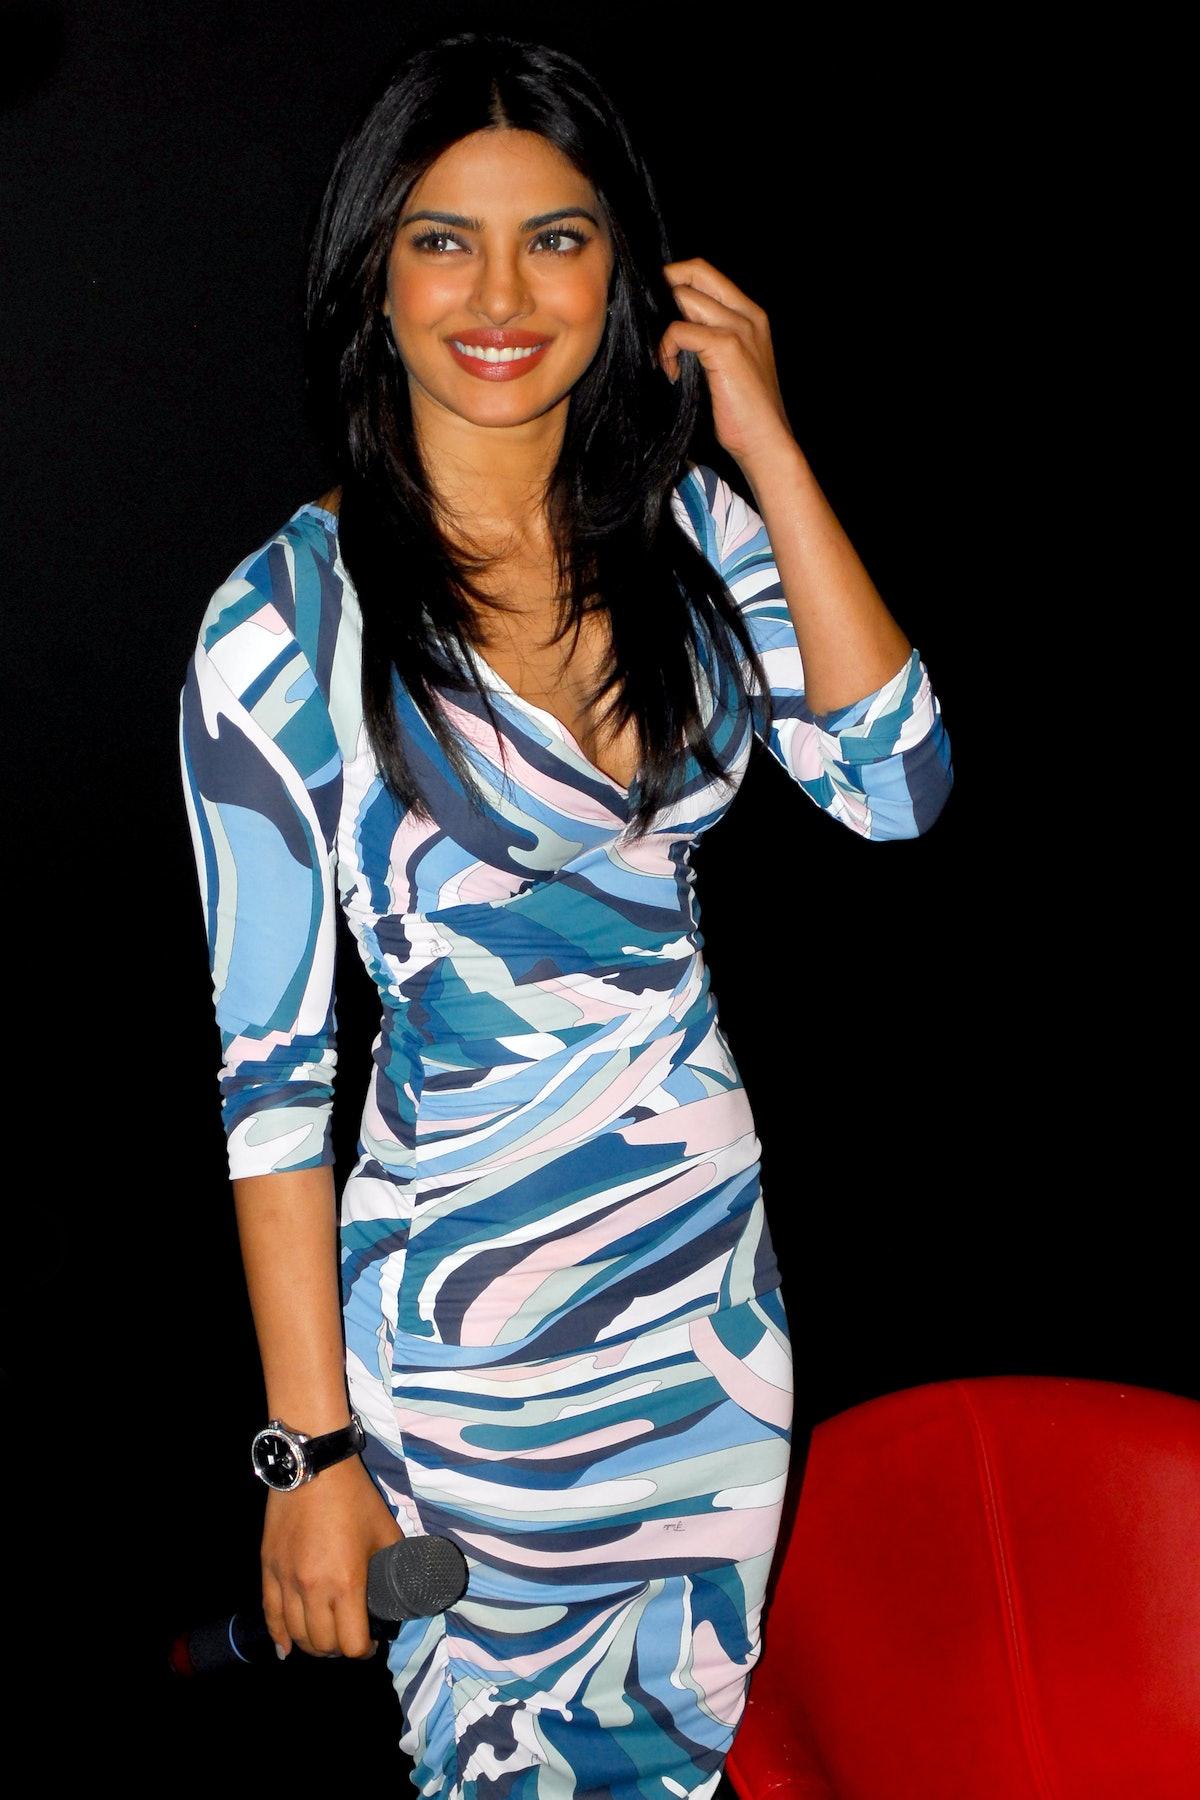 MUMBAI, INDIA - DECEMBER 23: Priyanka Chopra attends the trailer launch of the movie 'Agneepath' on ...